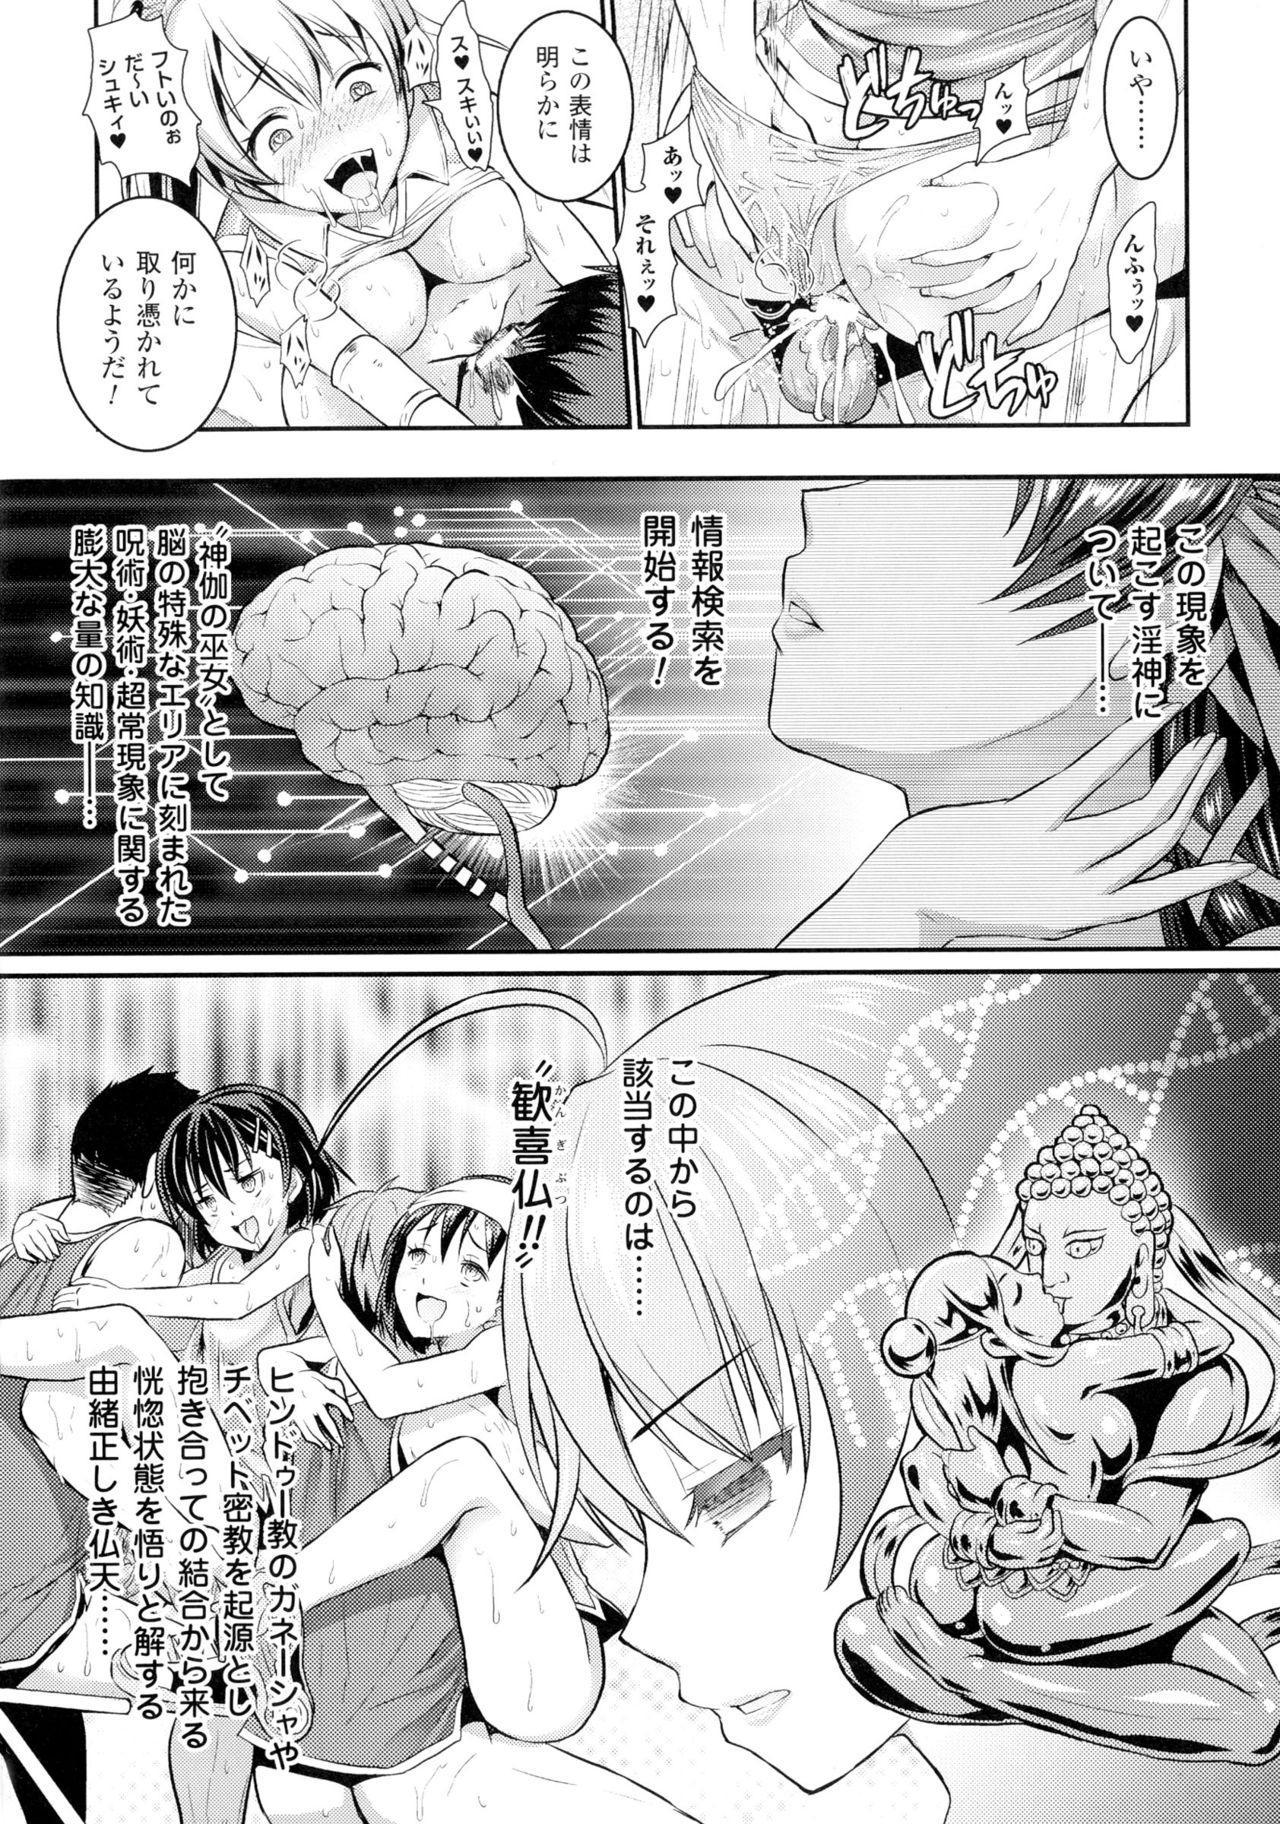 Seigi no Heroine Kangoku File DX Vol. 1 22